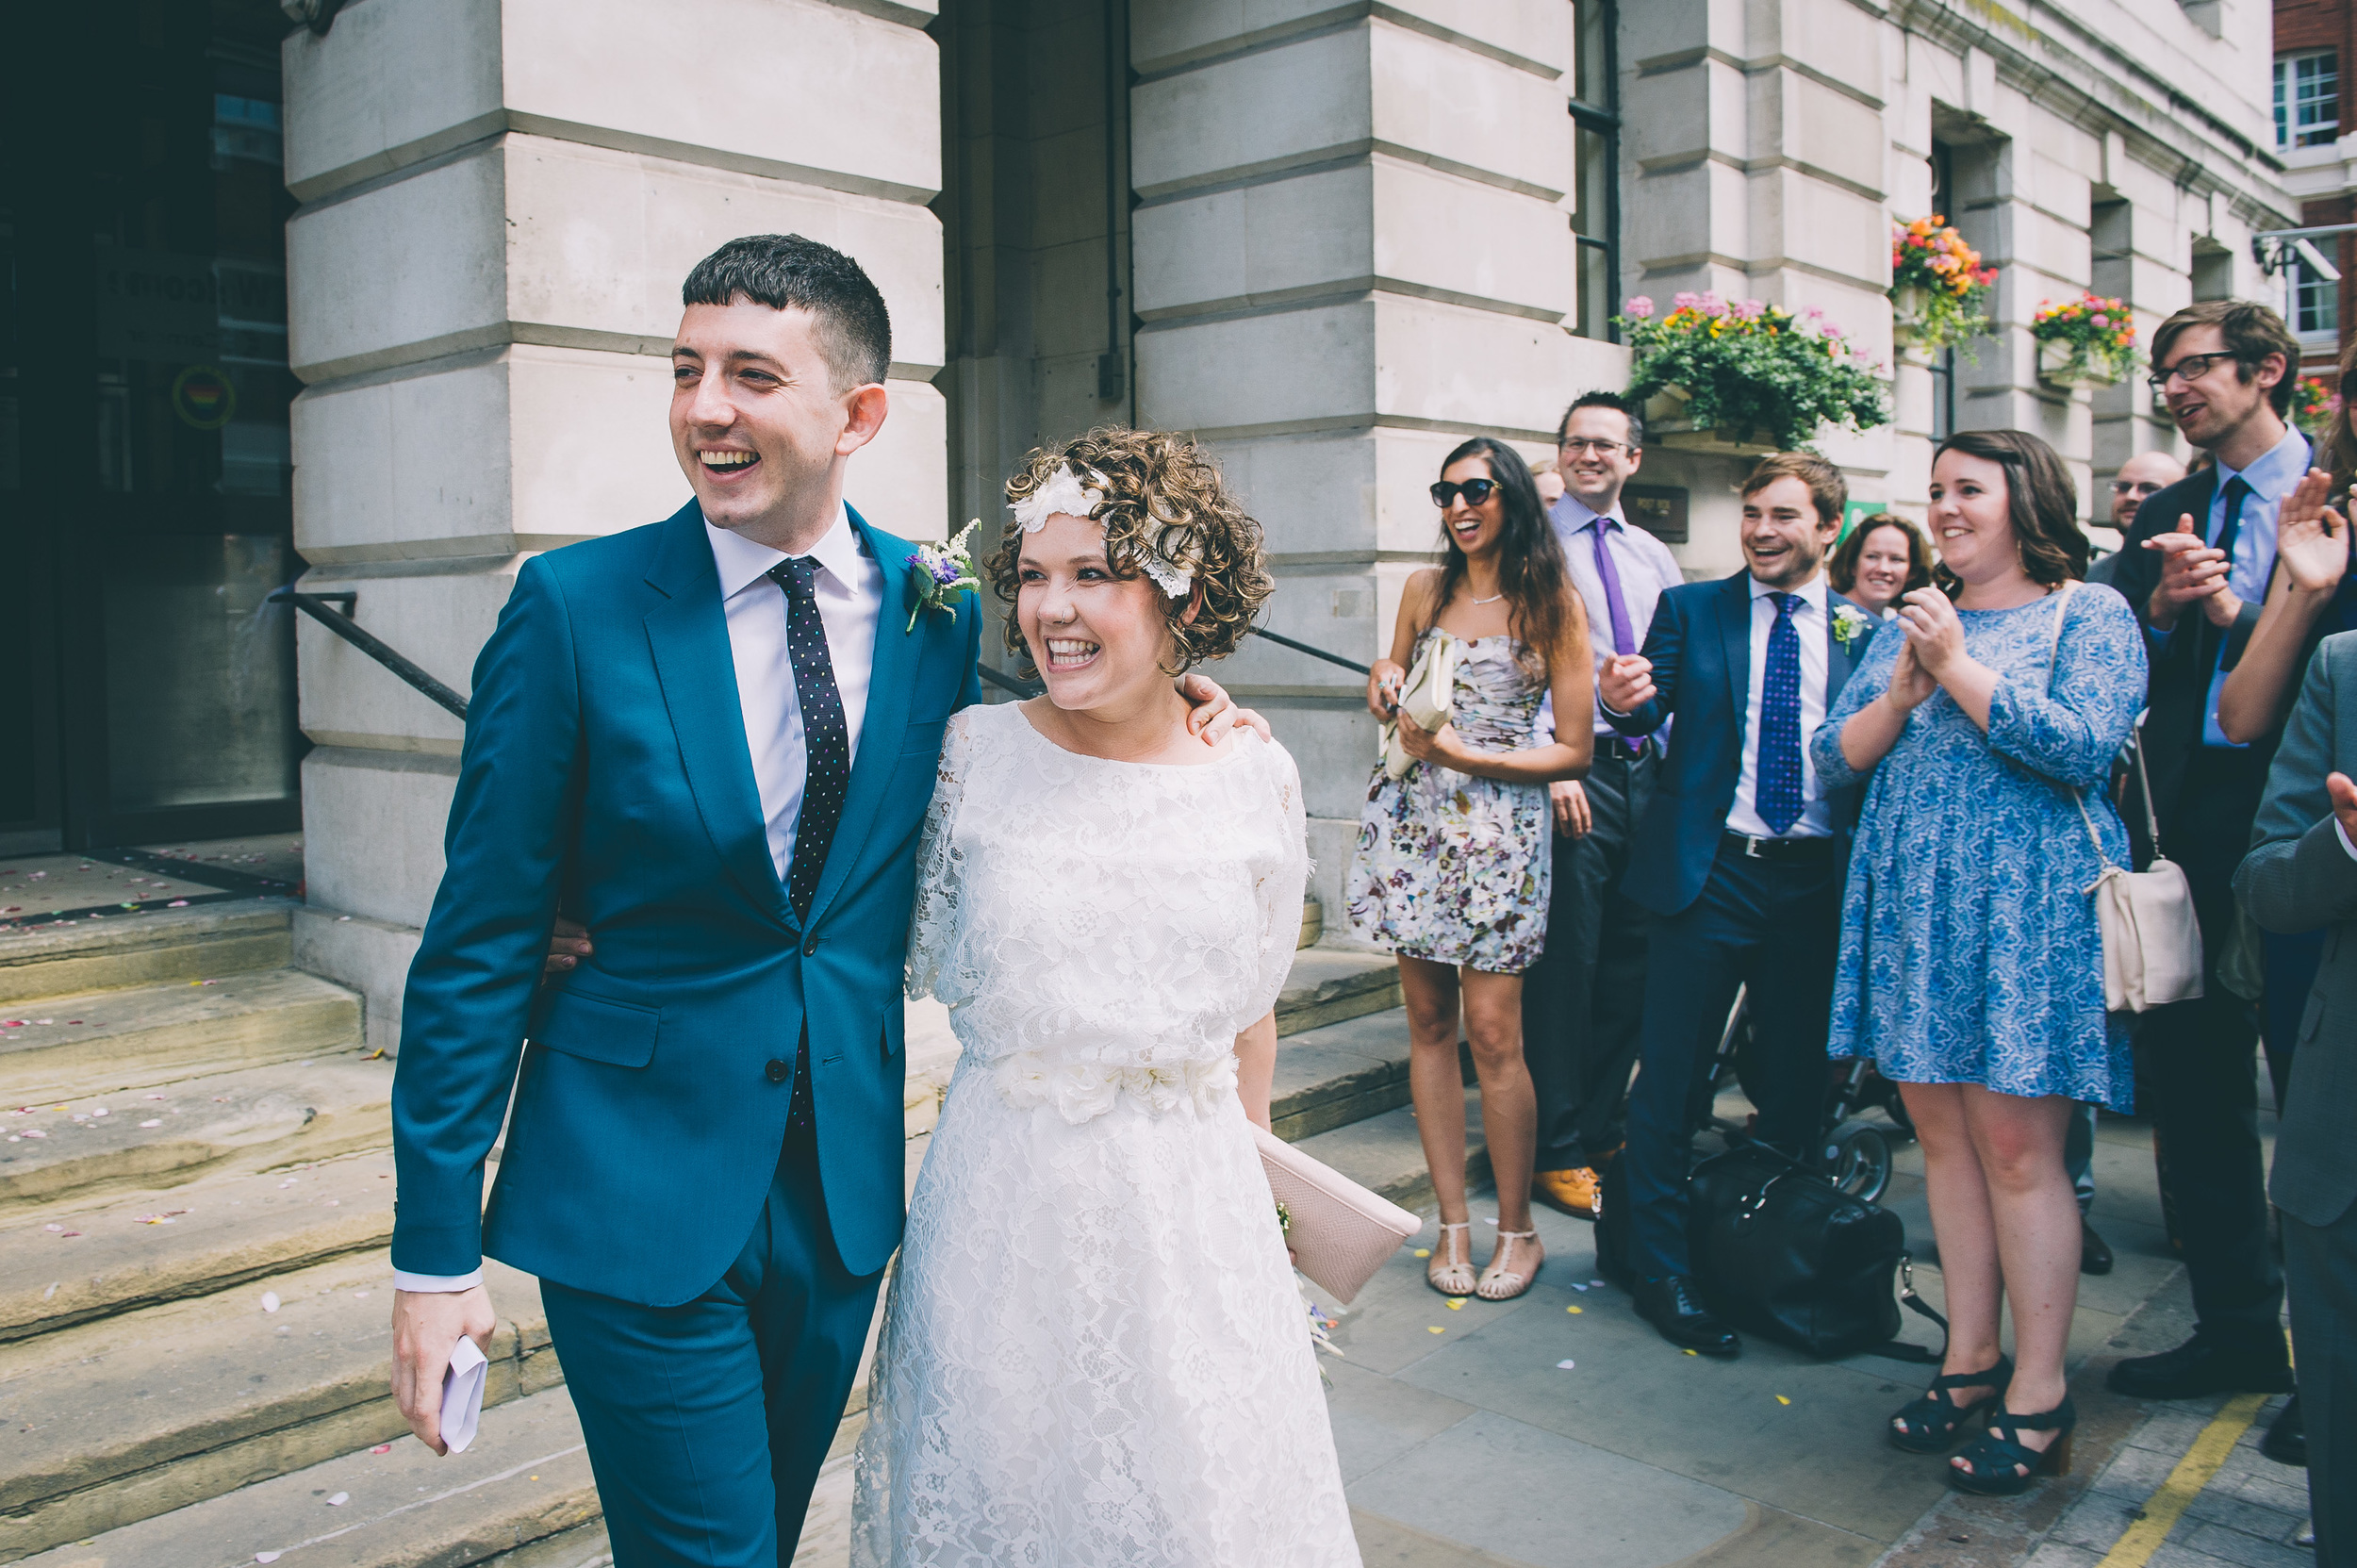 Camden town hall London wedding